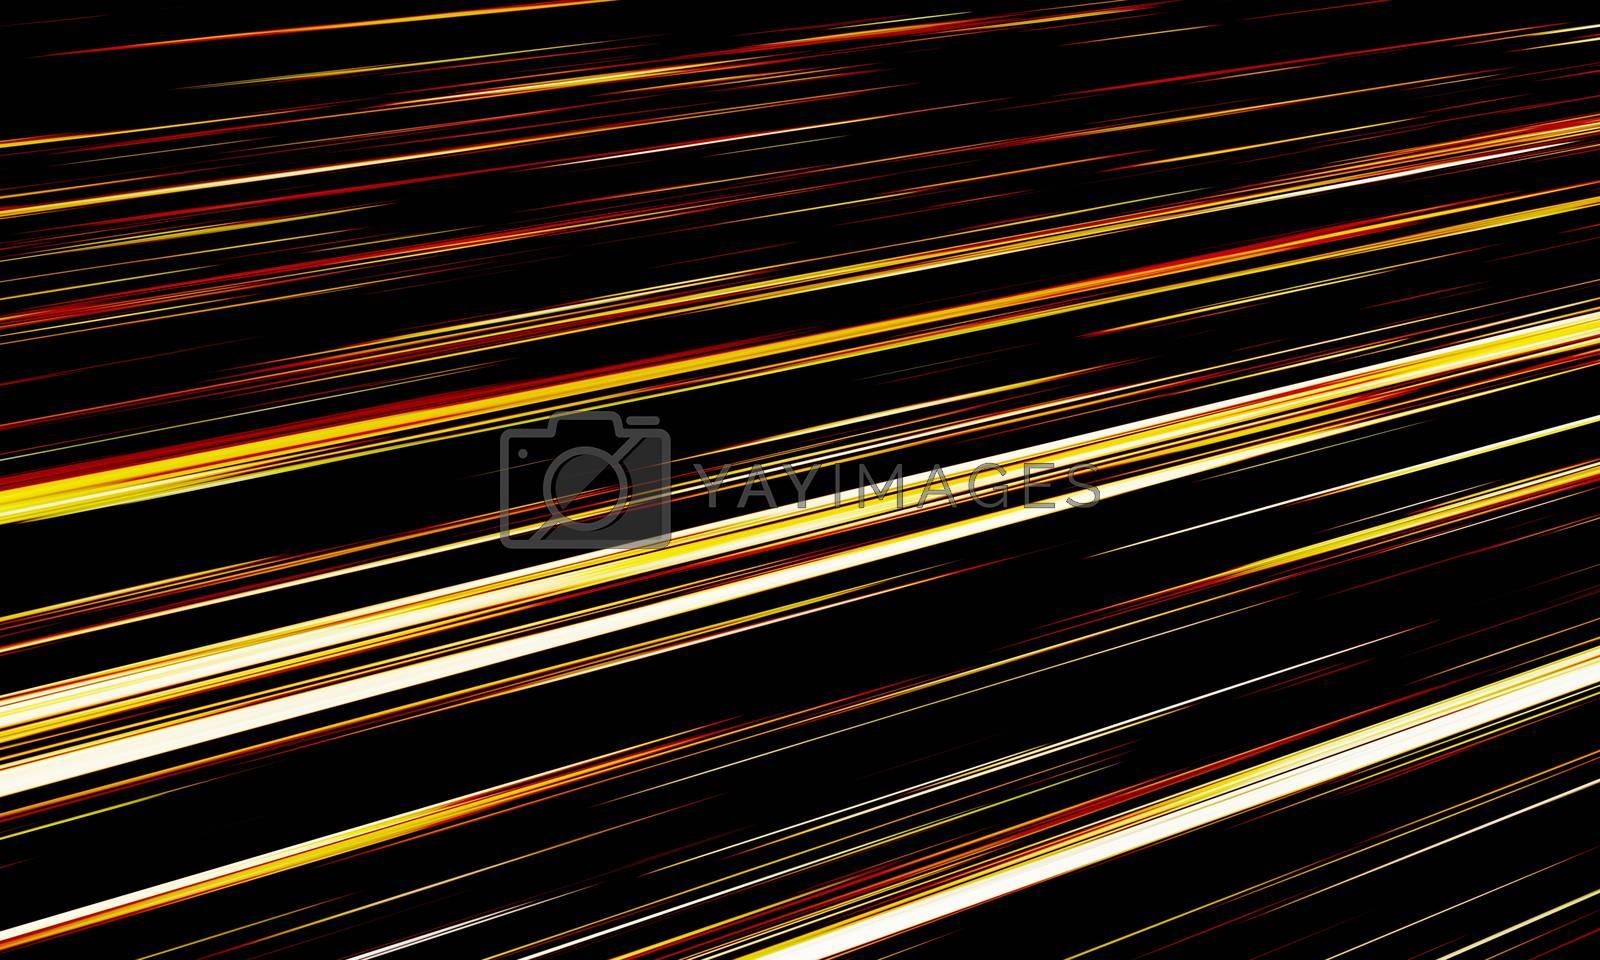 Golden Light  Rend line and stripes moving fast over dark background. 3D Rendering.